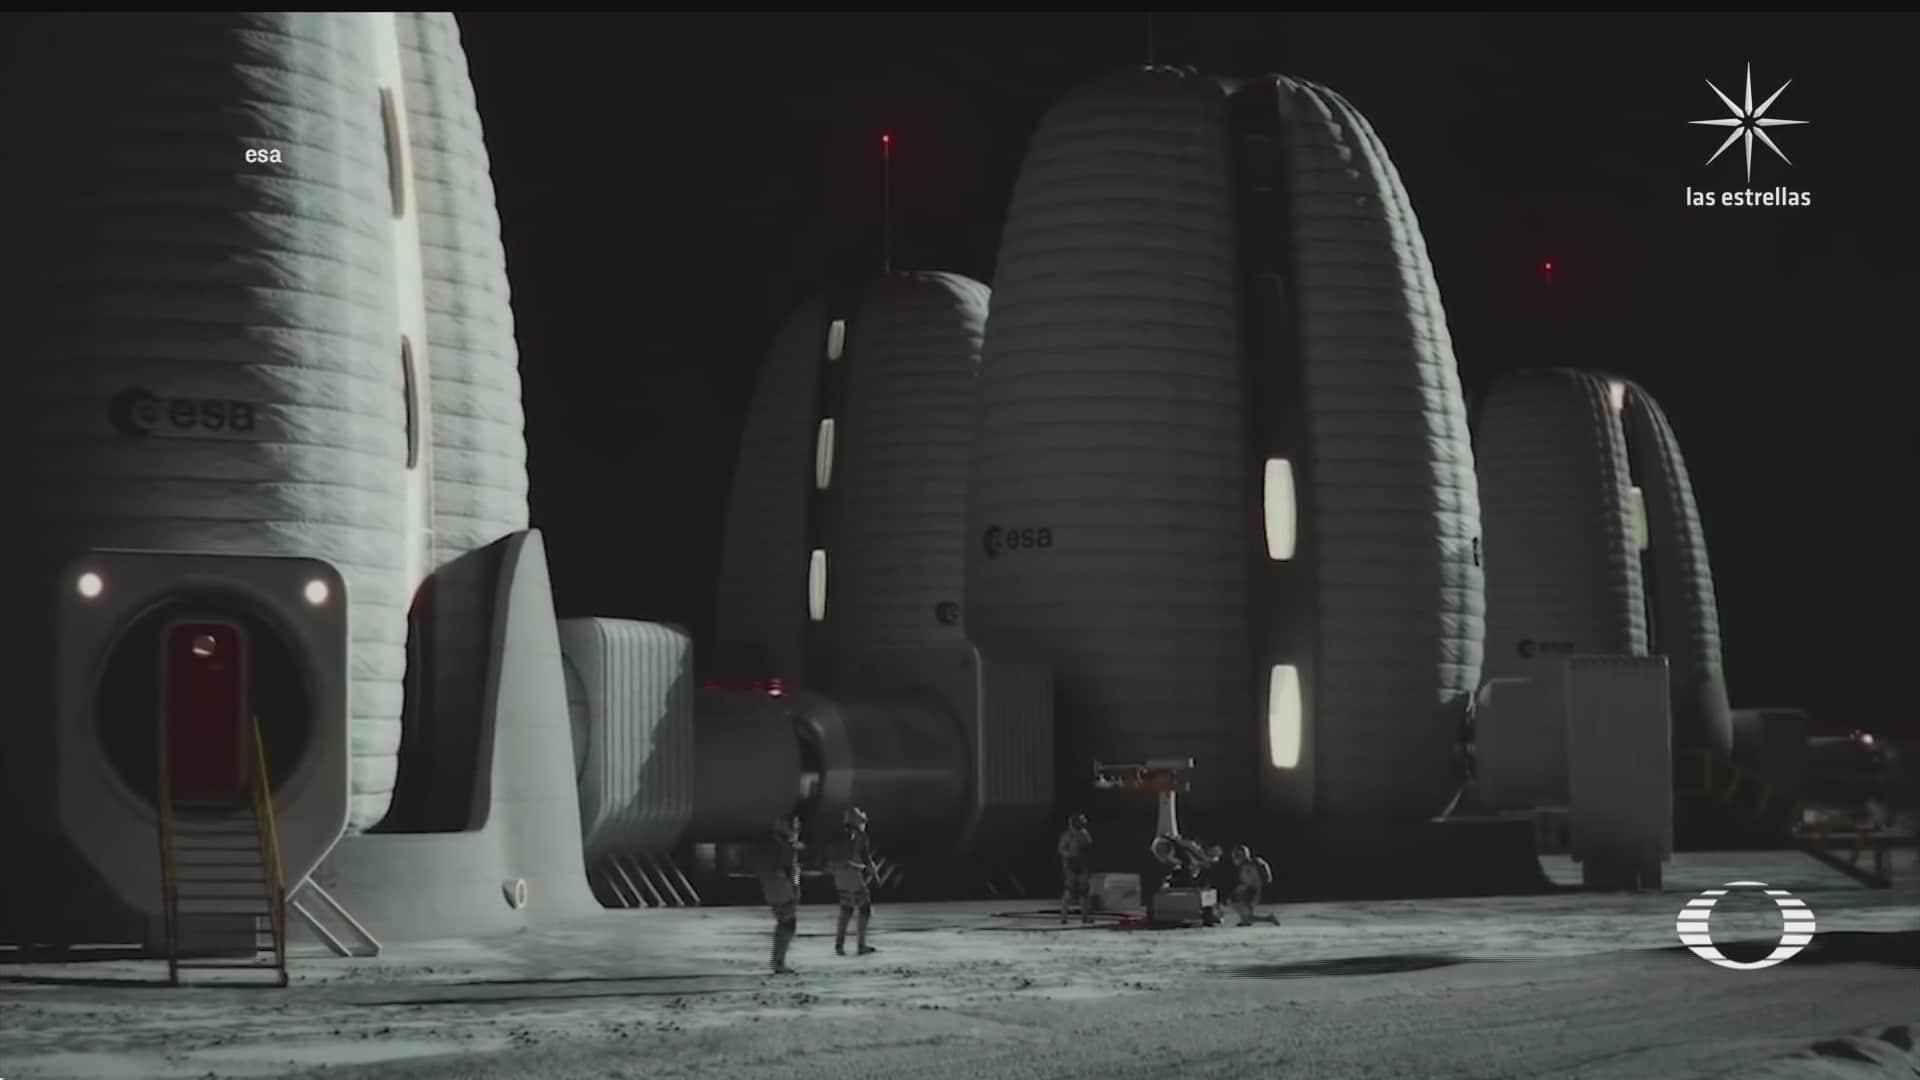 presentan prototipo de vivienda en la luna